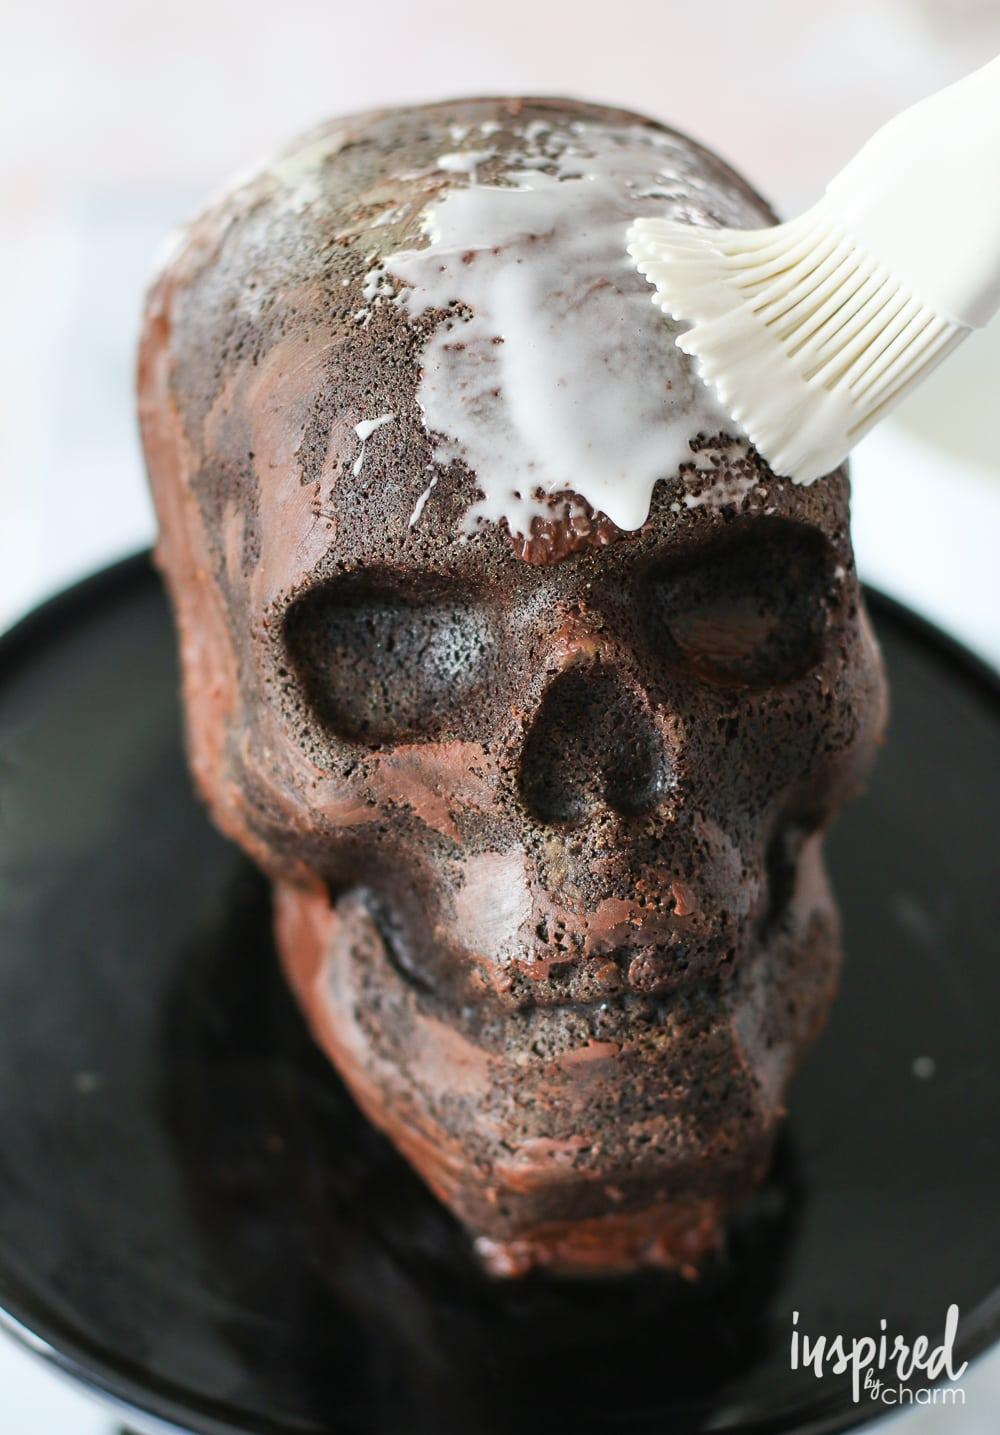 Chocolate Skull Cake Inspired By Charm